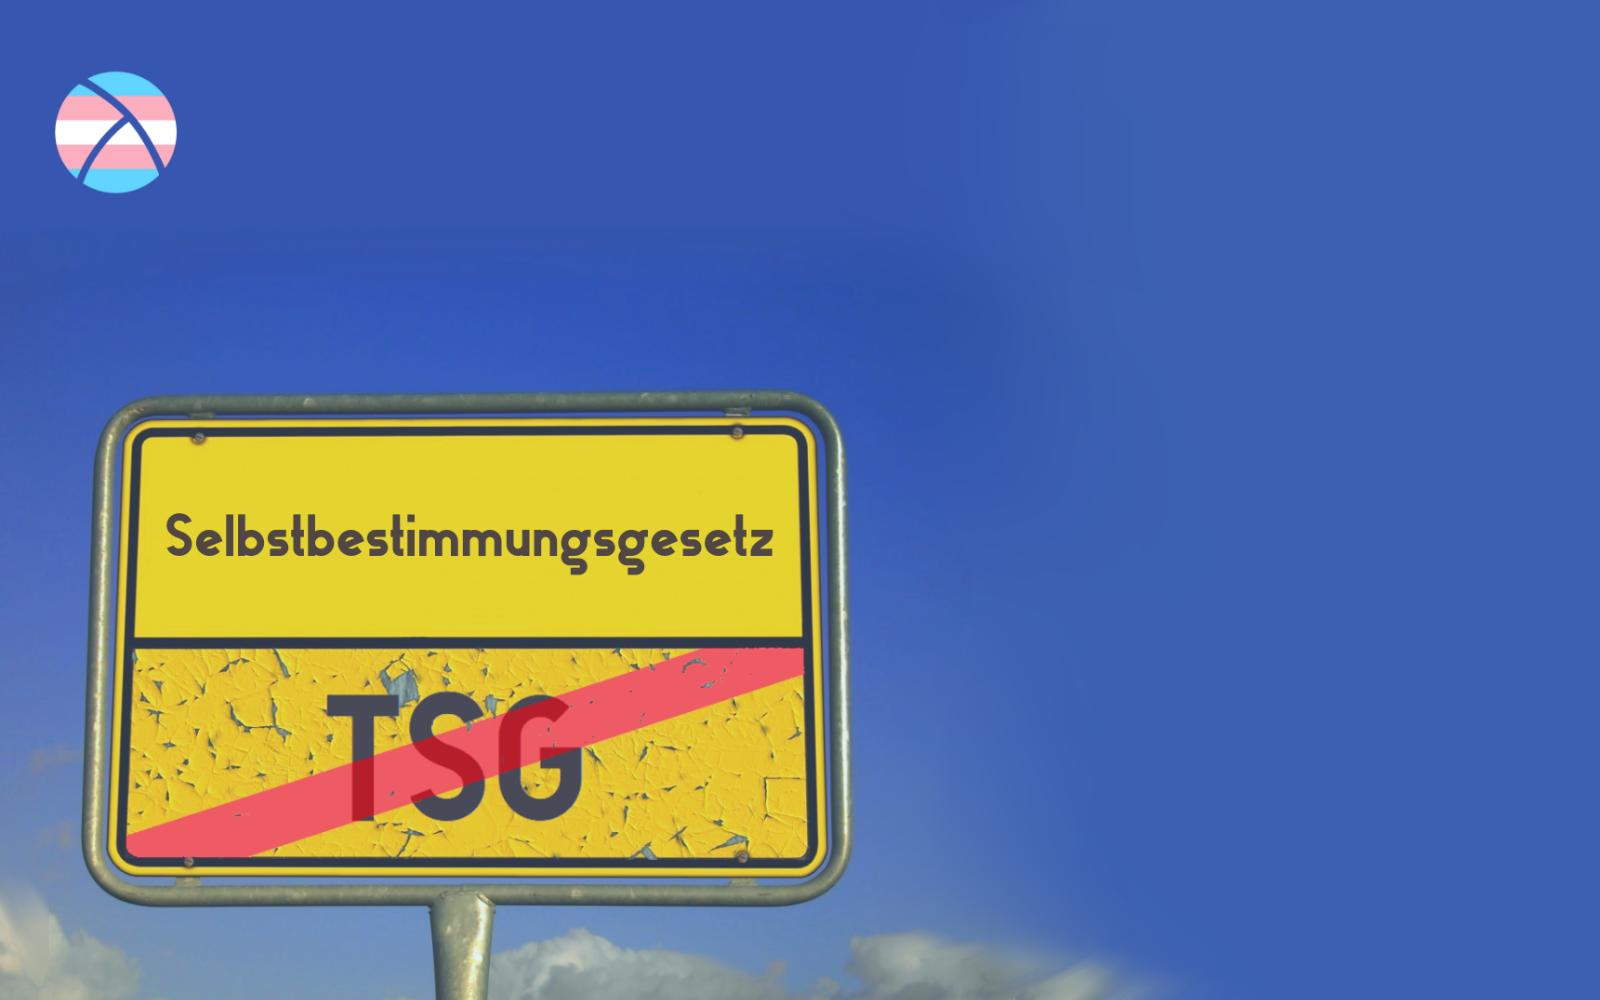 Tschüss, TSG! E-Mail-Aktion des Referat Trans*